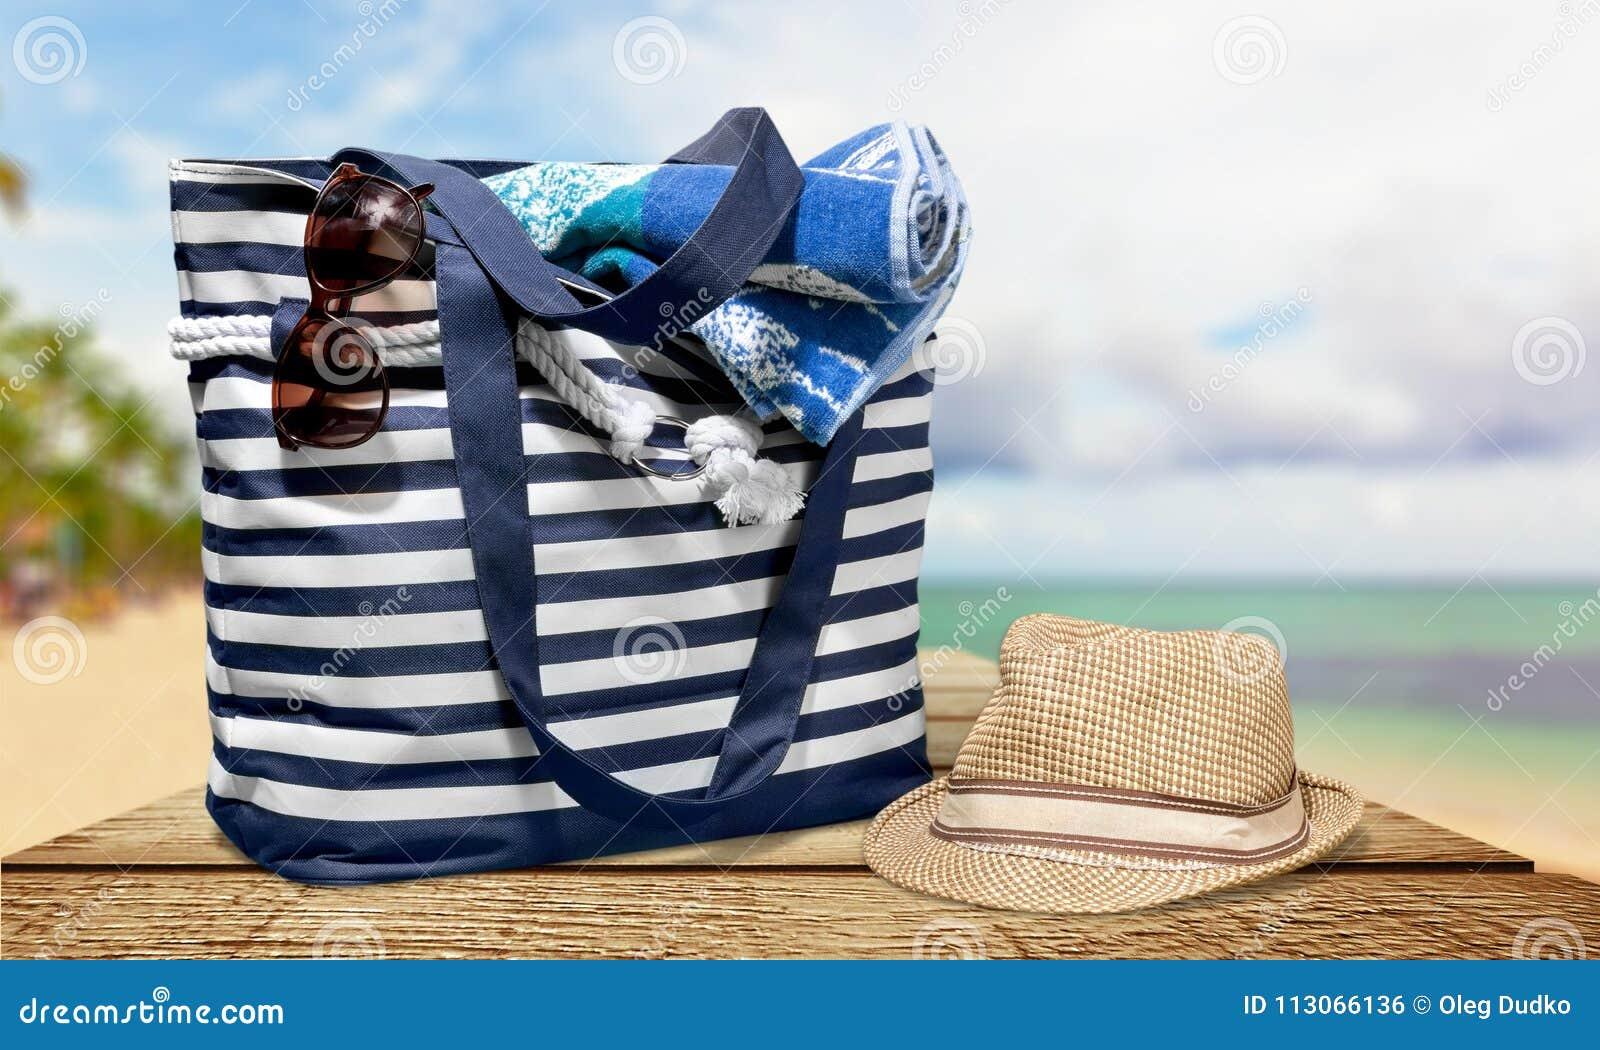 03ab60fb6 Beach Bag On Sand Of Tropical Beach Stock Photo - Image of isolated ...